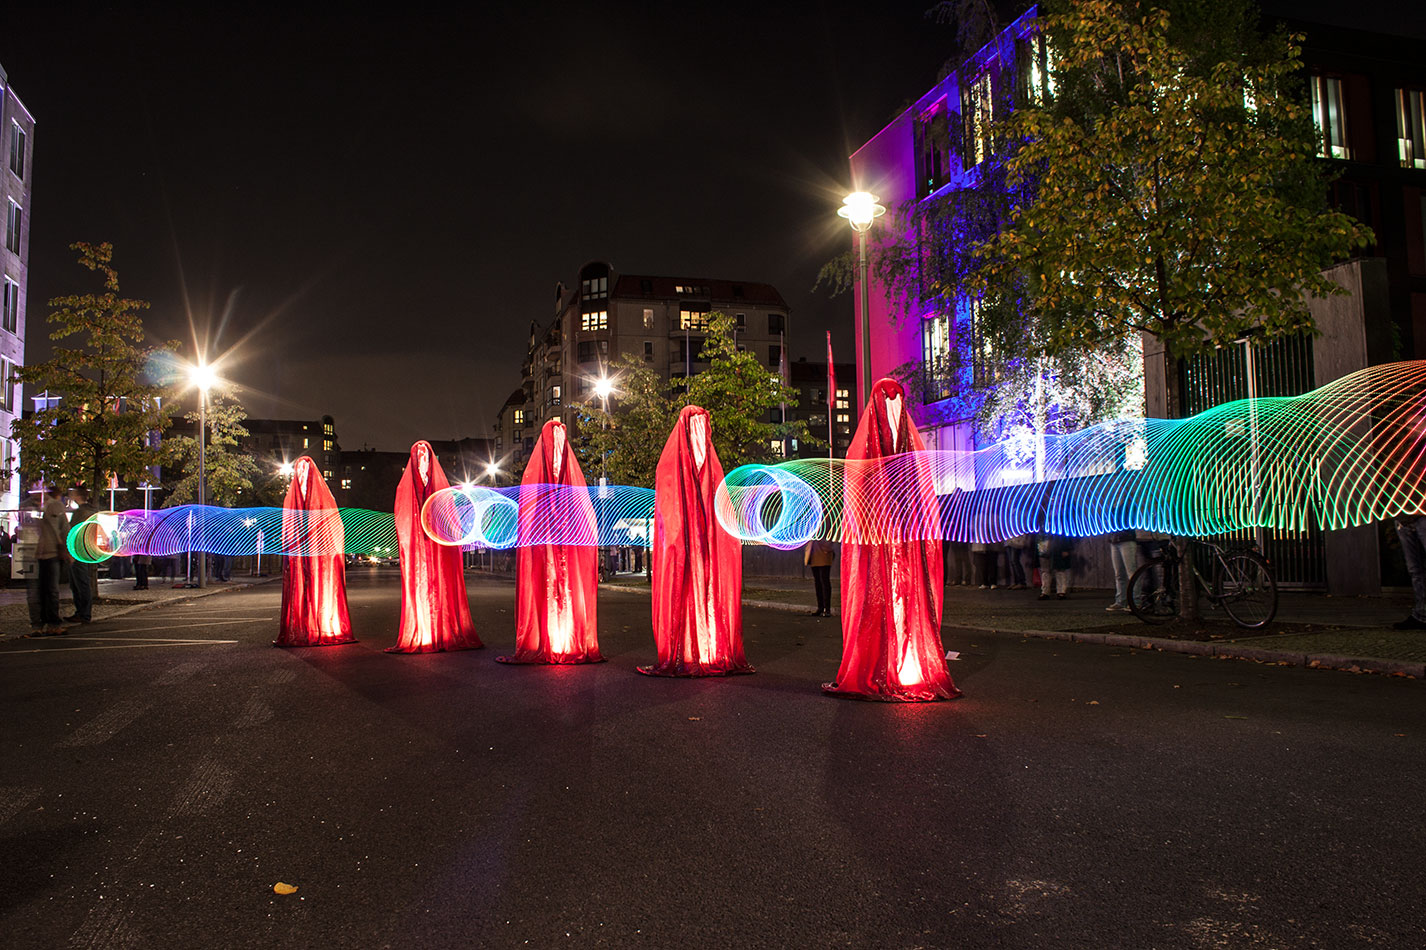 festival-of-lights-berlin-ministergaerten-light-art-festival-contemporary-fine-art-design-show-guardiansof-time-manfred-kili-kielnhofer-sculpture-3645